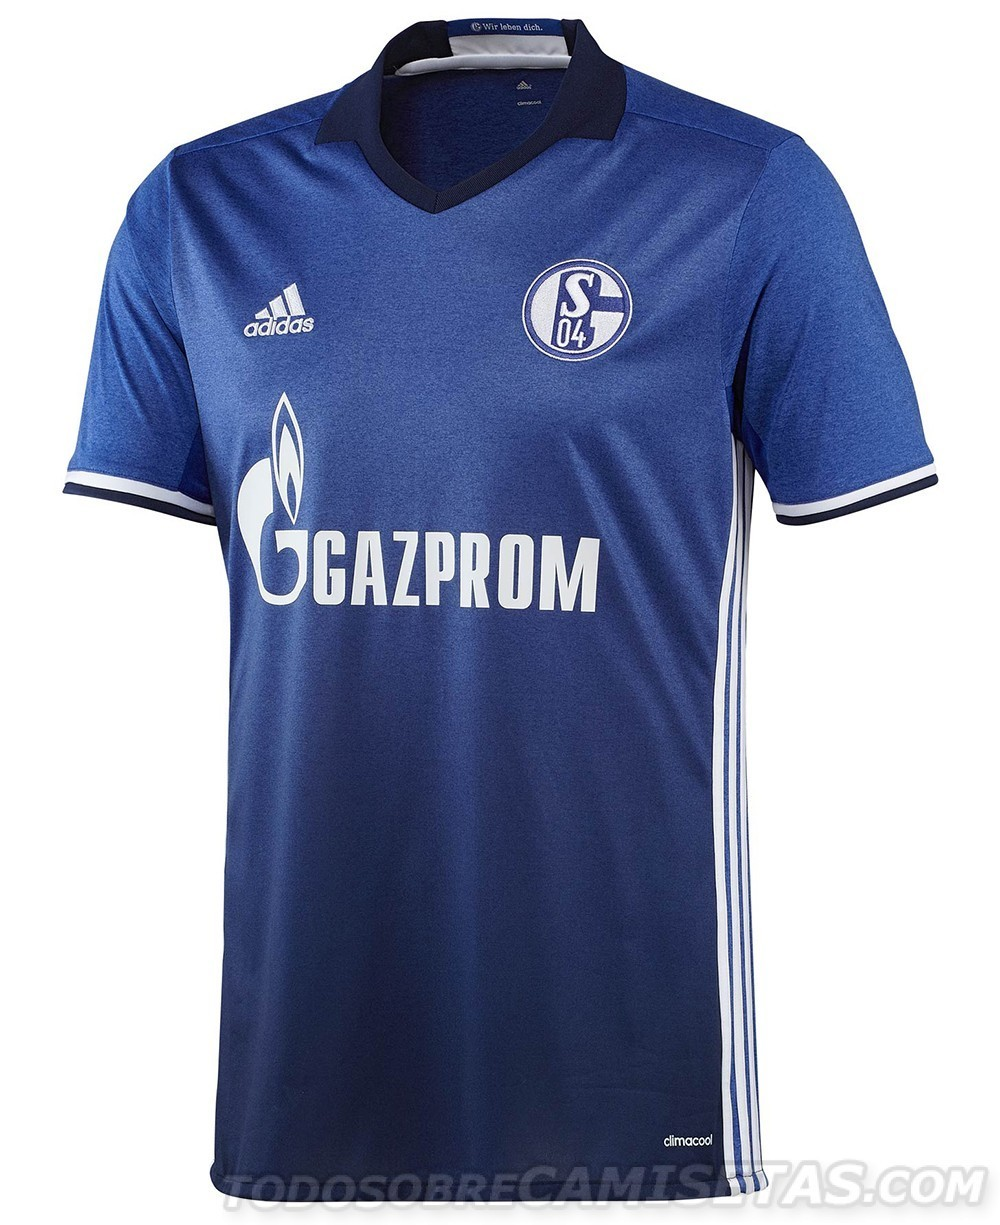 Schalke-04-16-17-adidas-home-kit-2.jpg